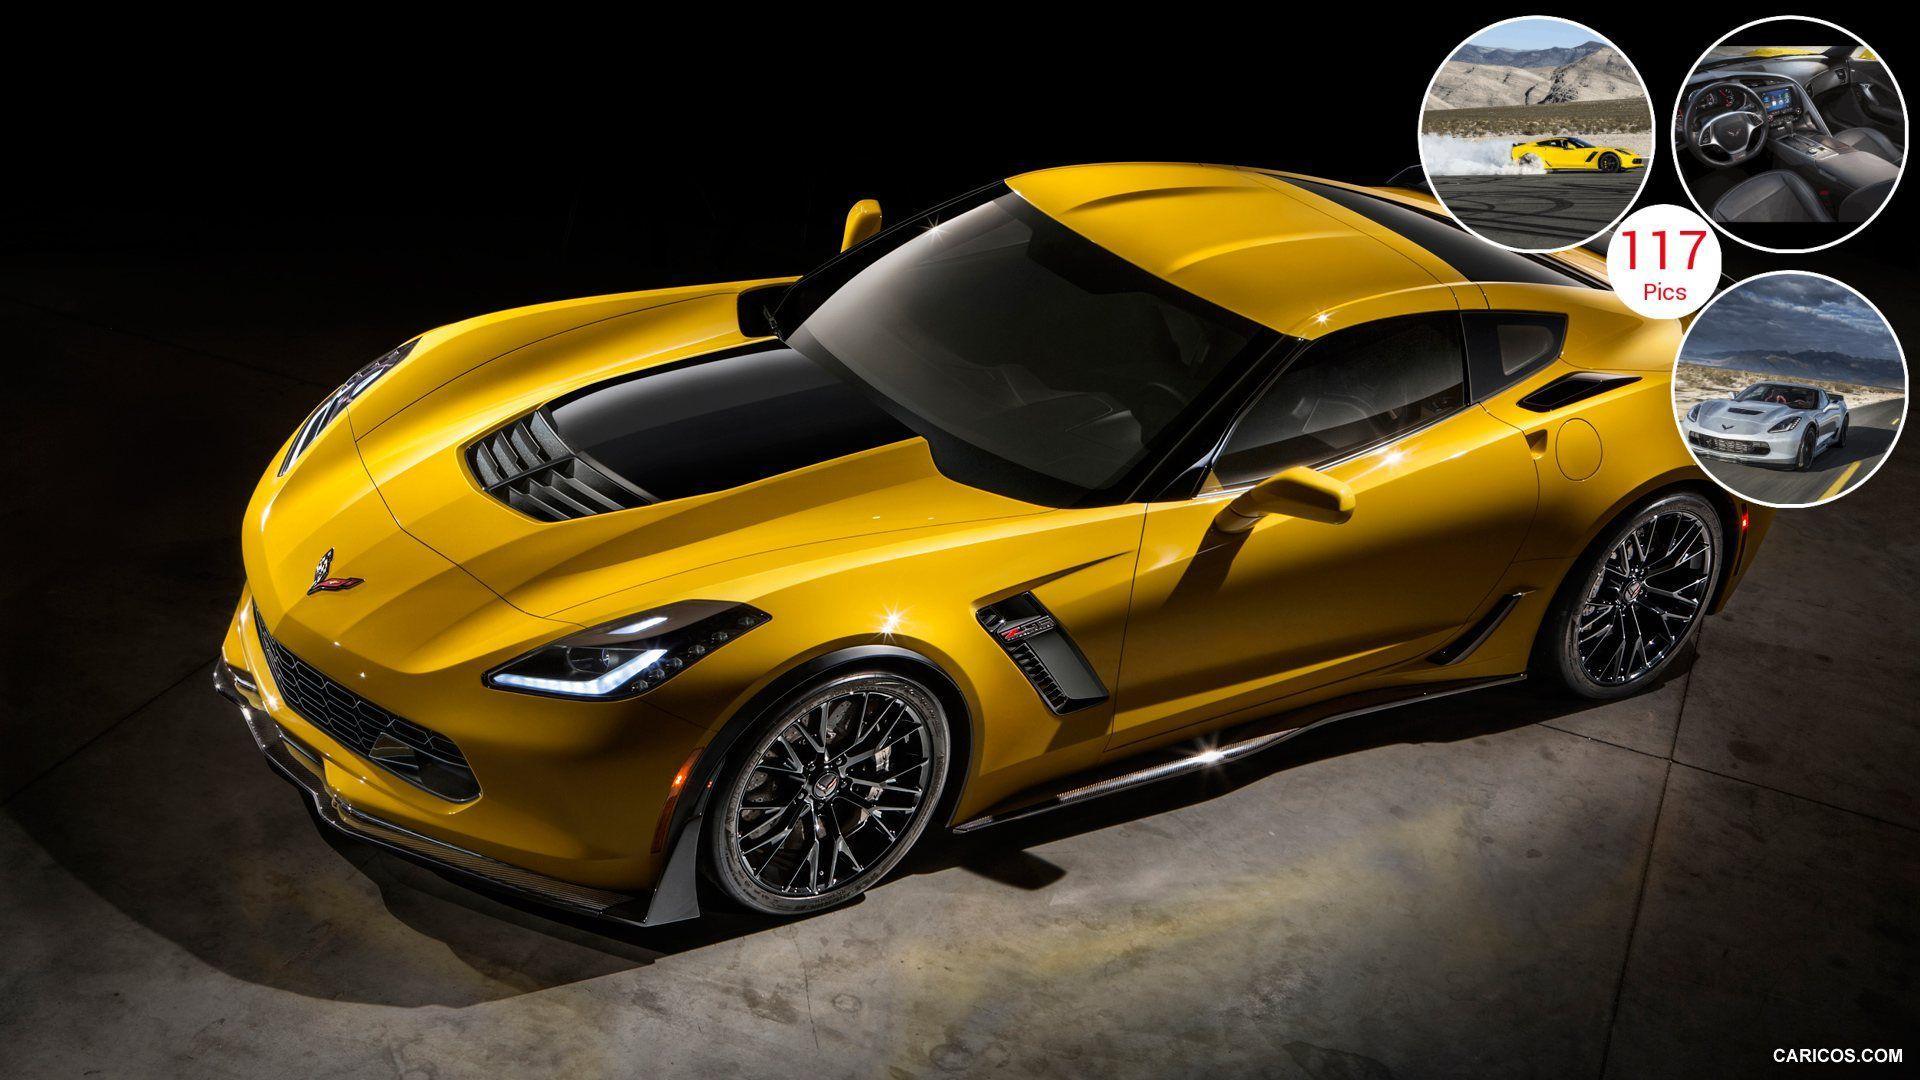 1920x1080 Chevrolet Corvette Stingray C7 Hd Cars 4k Wallpapers Images